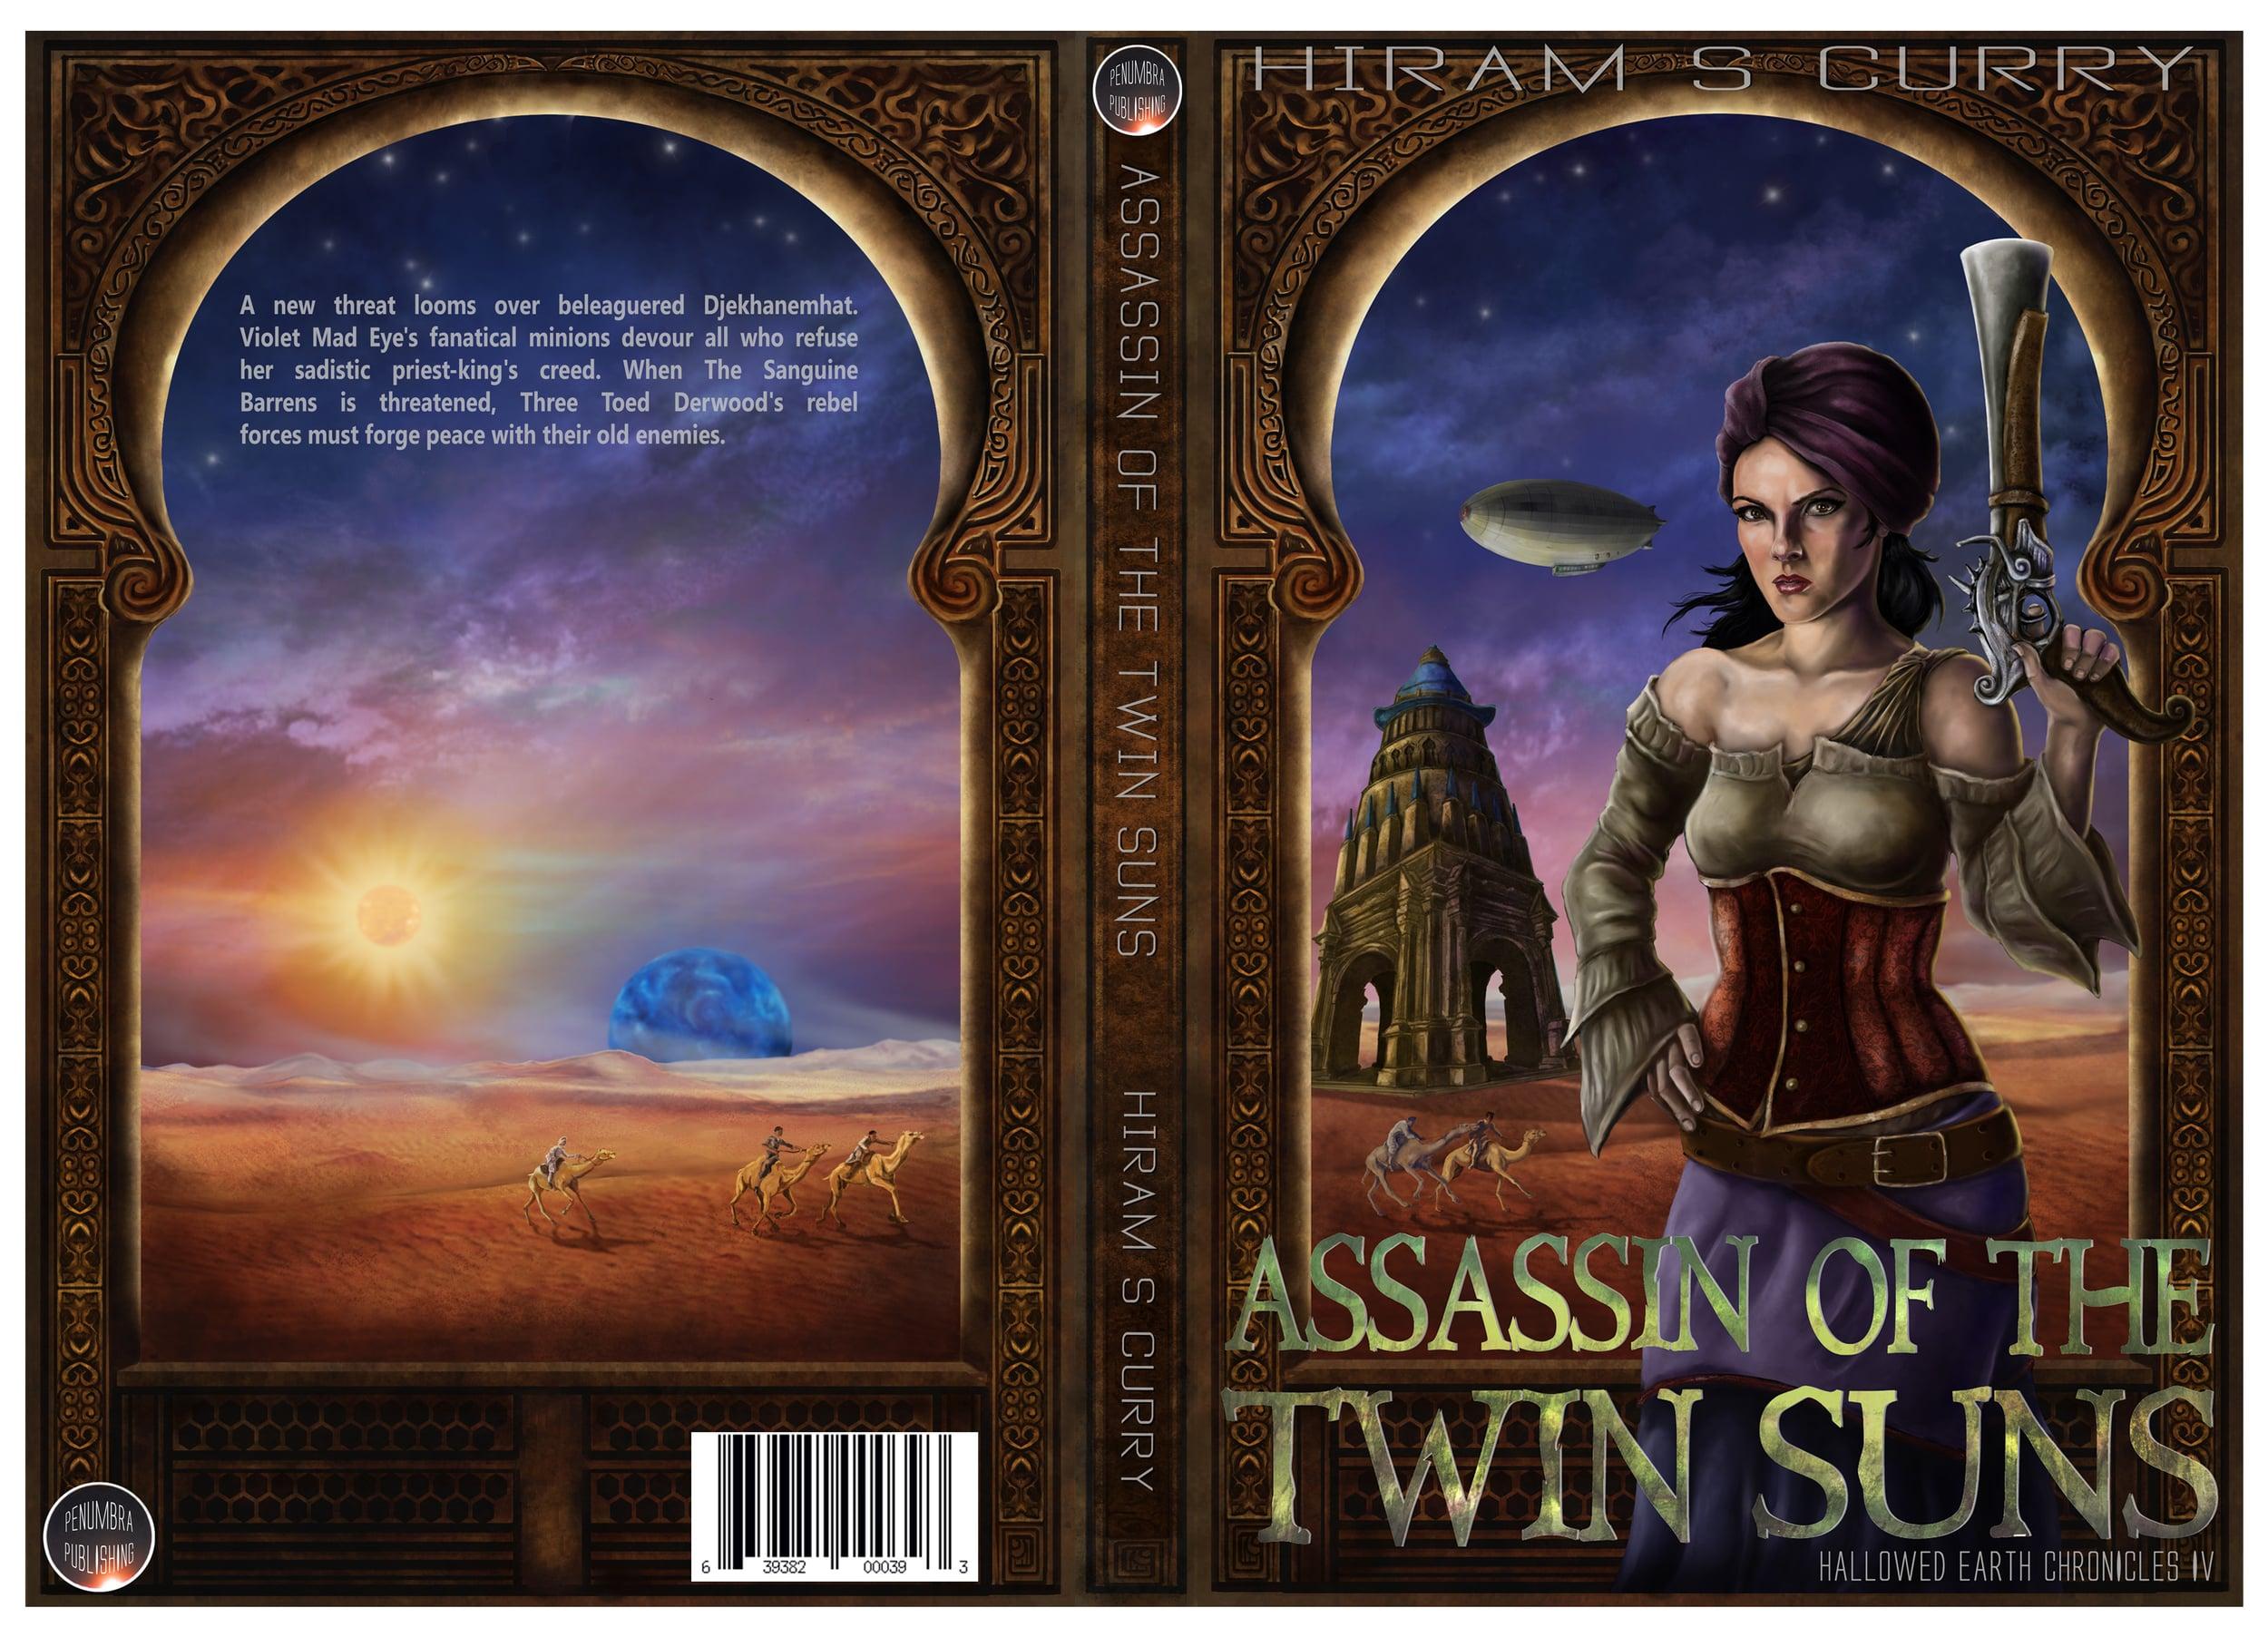 book cover - digital media                                                     $200